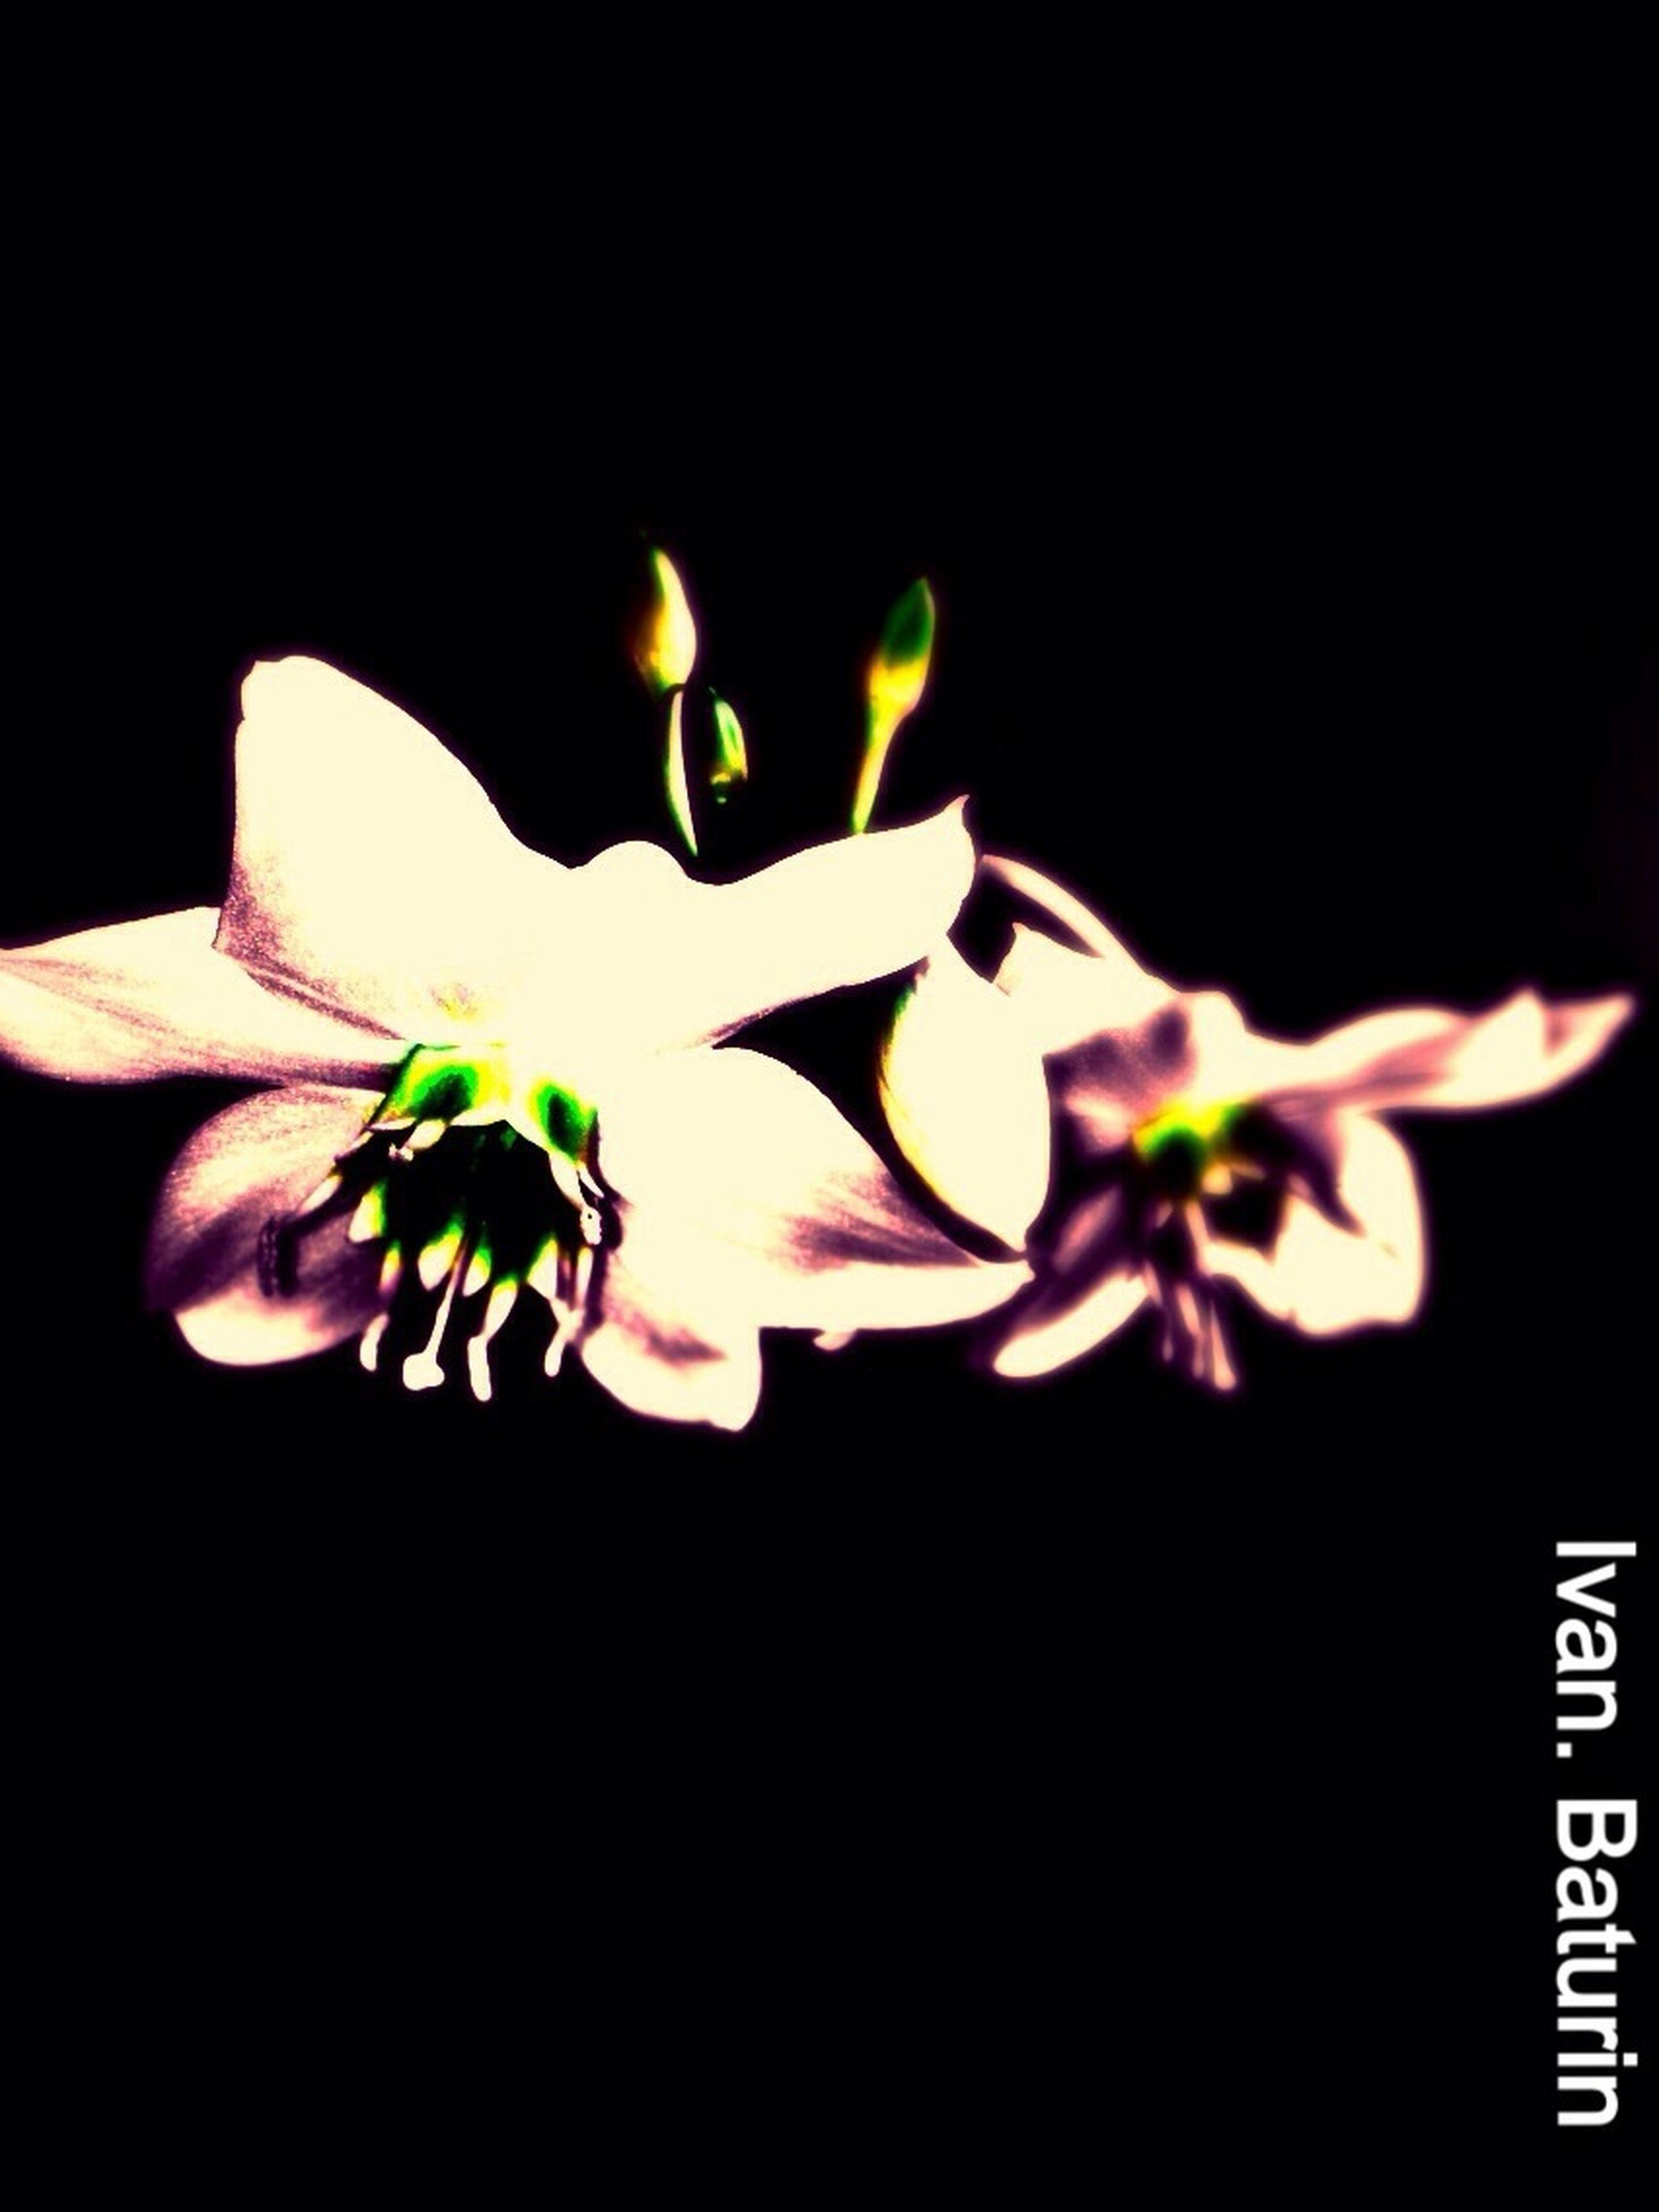 close-up, flower, black background, petal, studio shot, freshness, fragility, nature, flower head, dark, multi colored, focus on foreground, blossom, springtime, beauty in nature, no people, bloom, botany